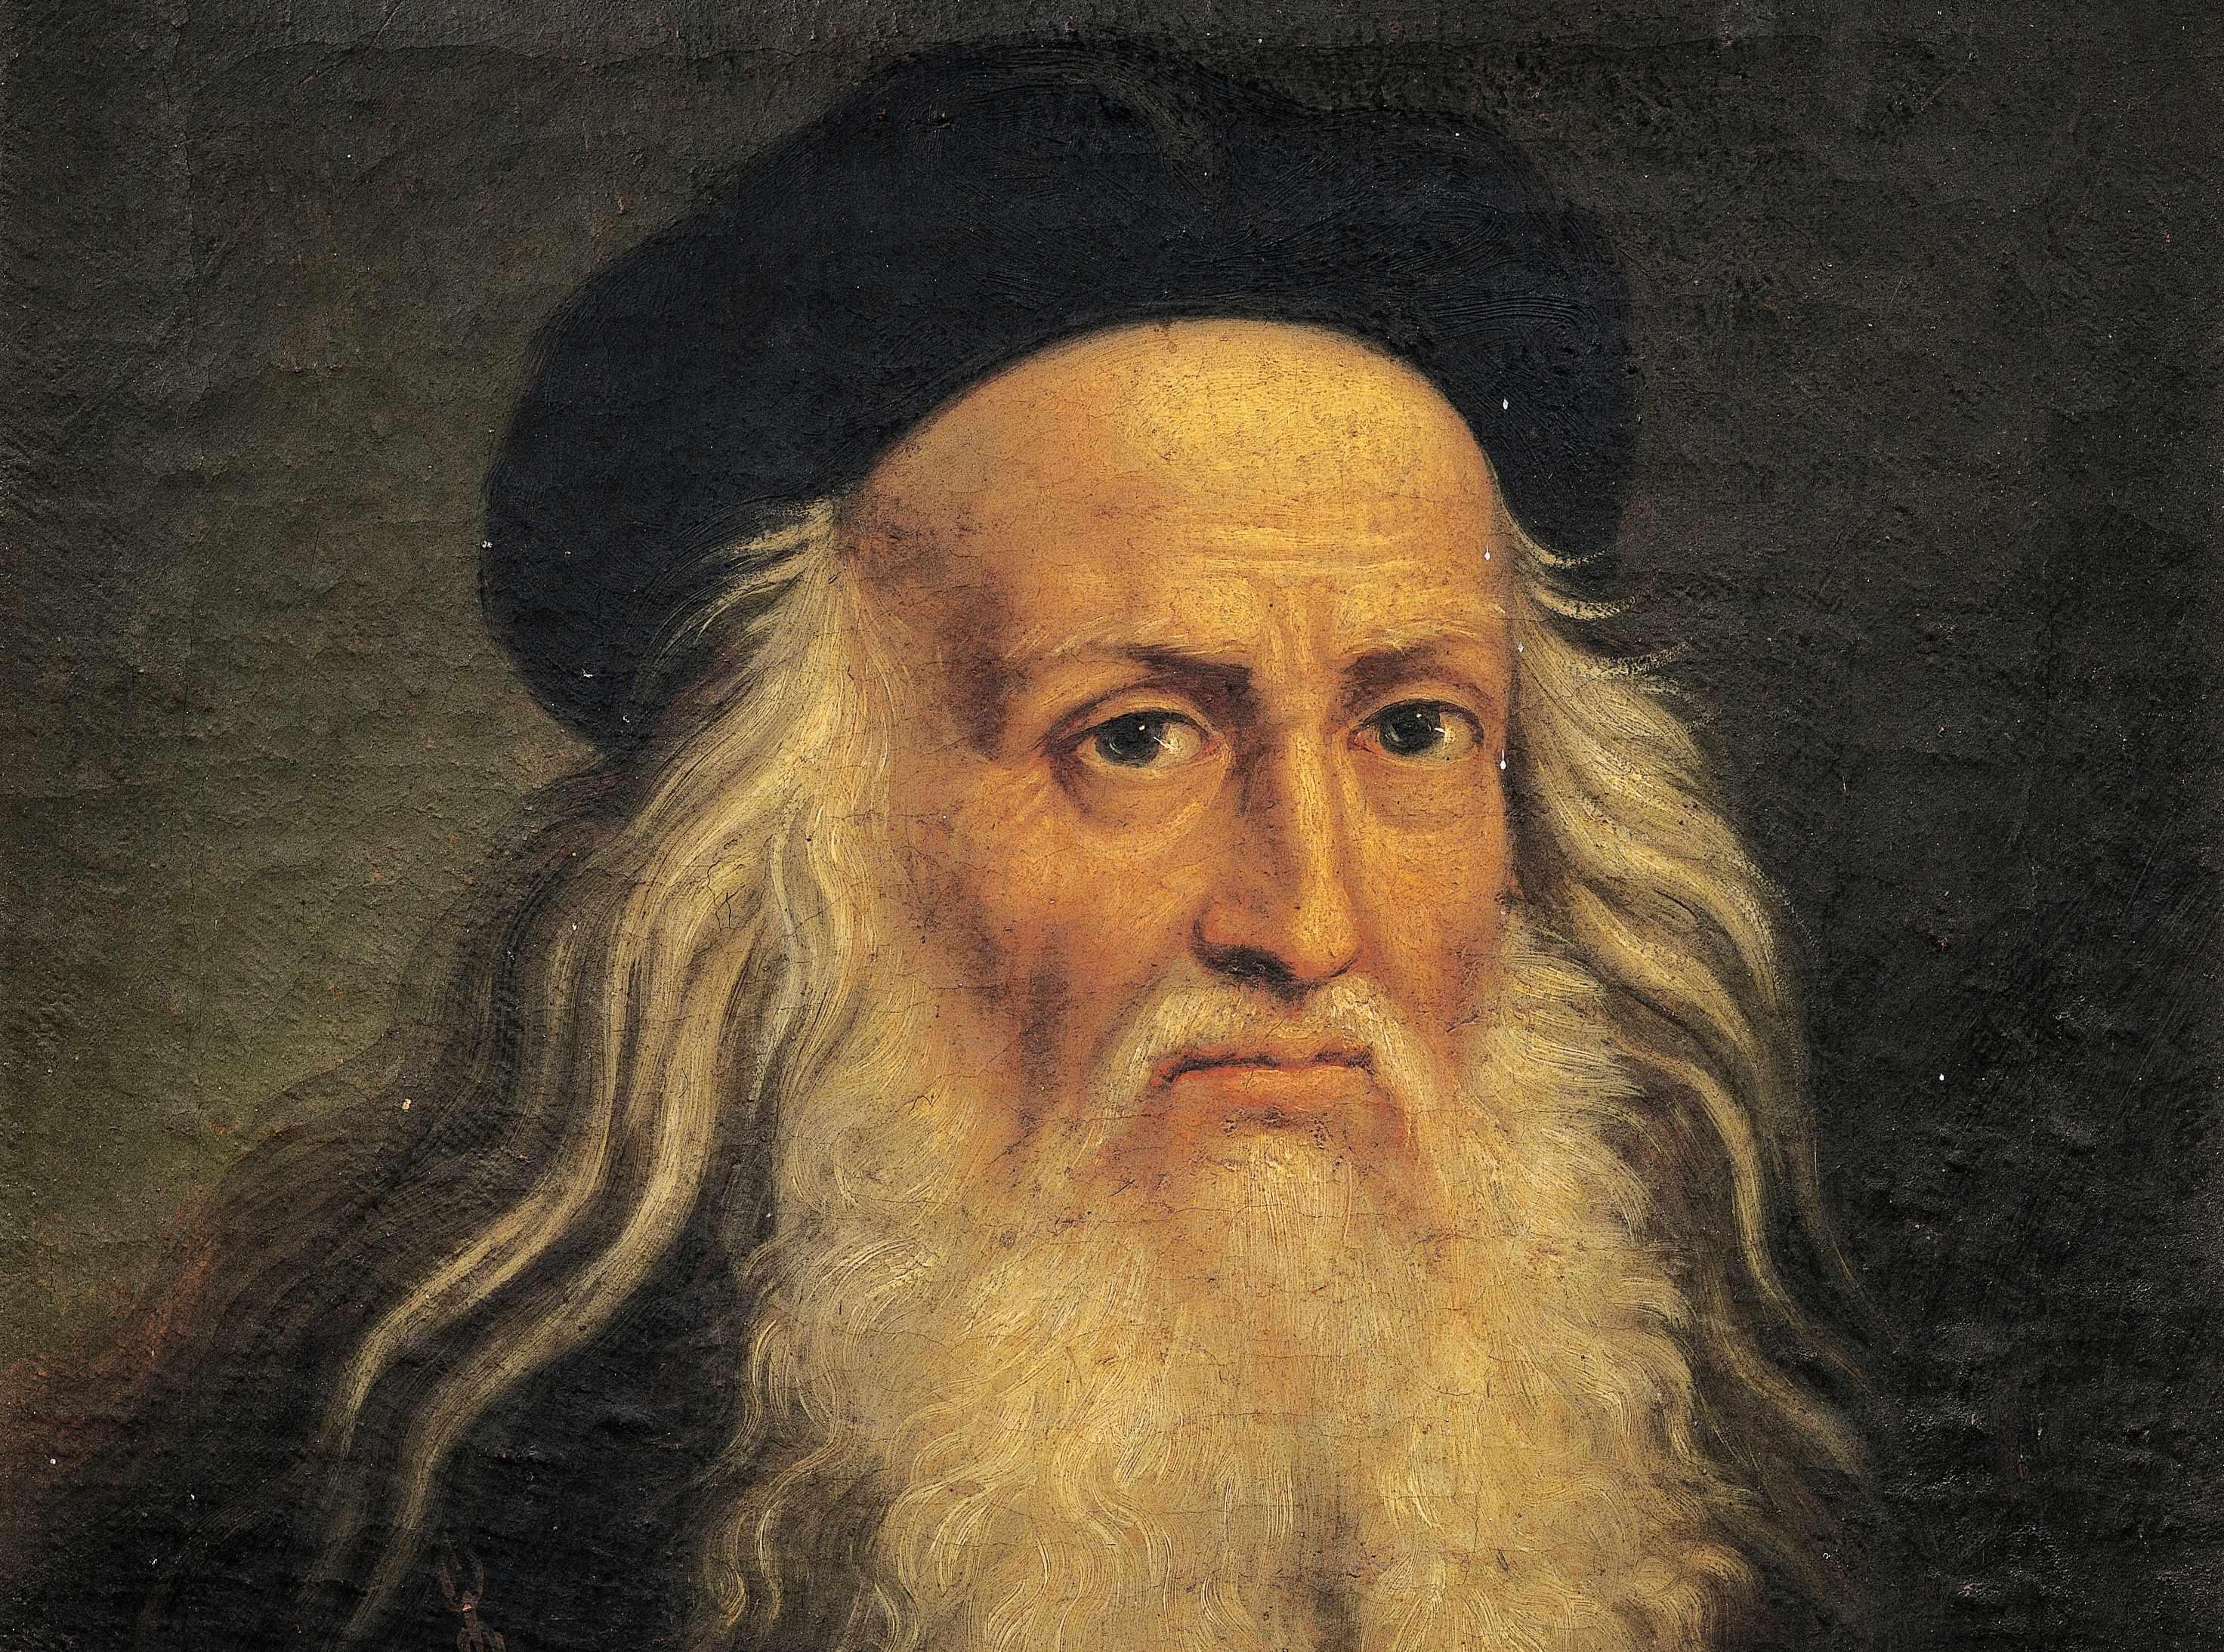 Leonardo da Vinci - Getty Images